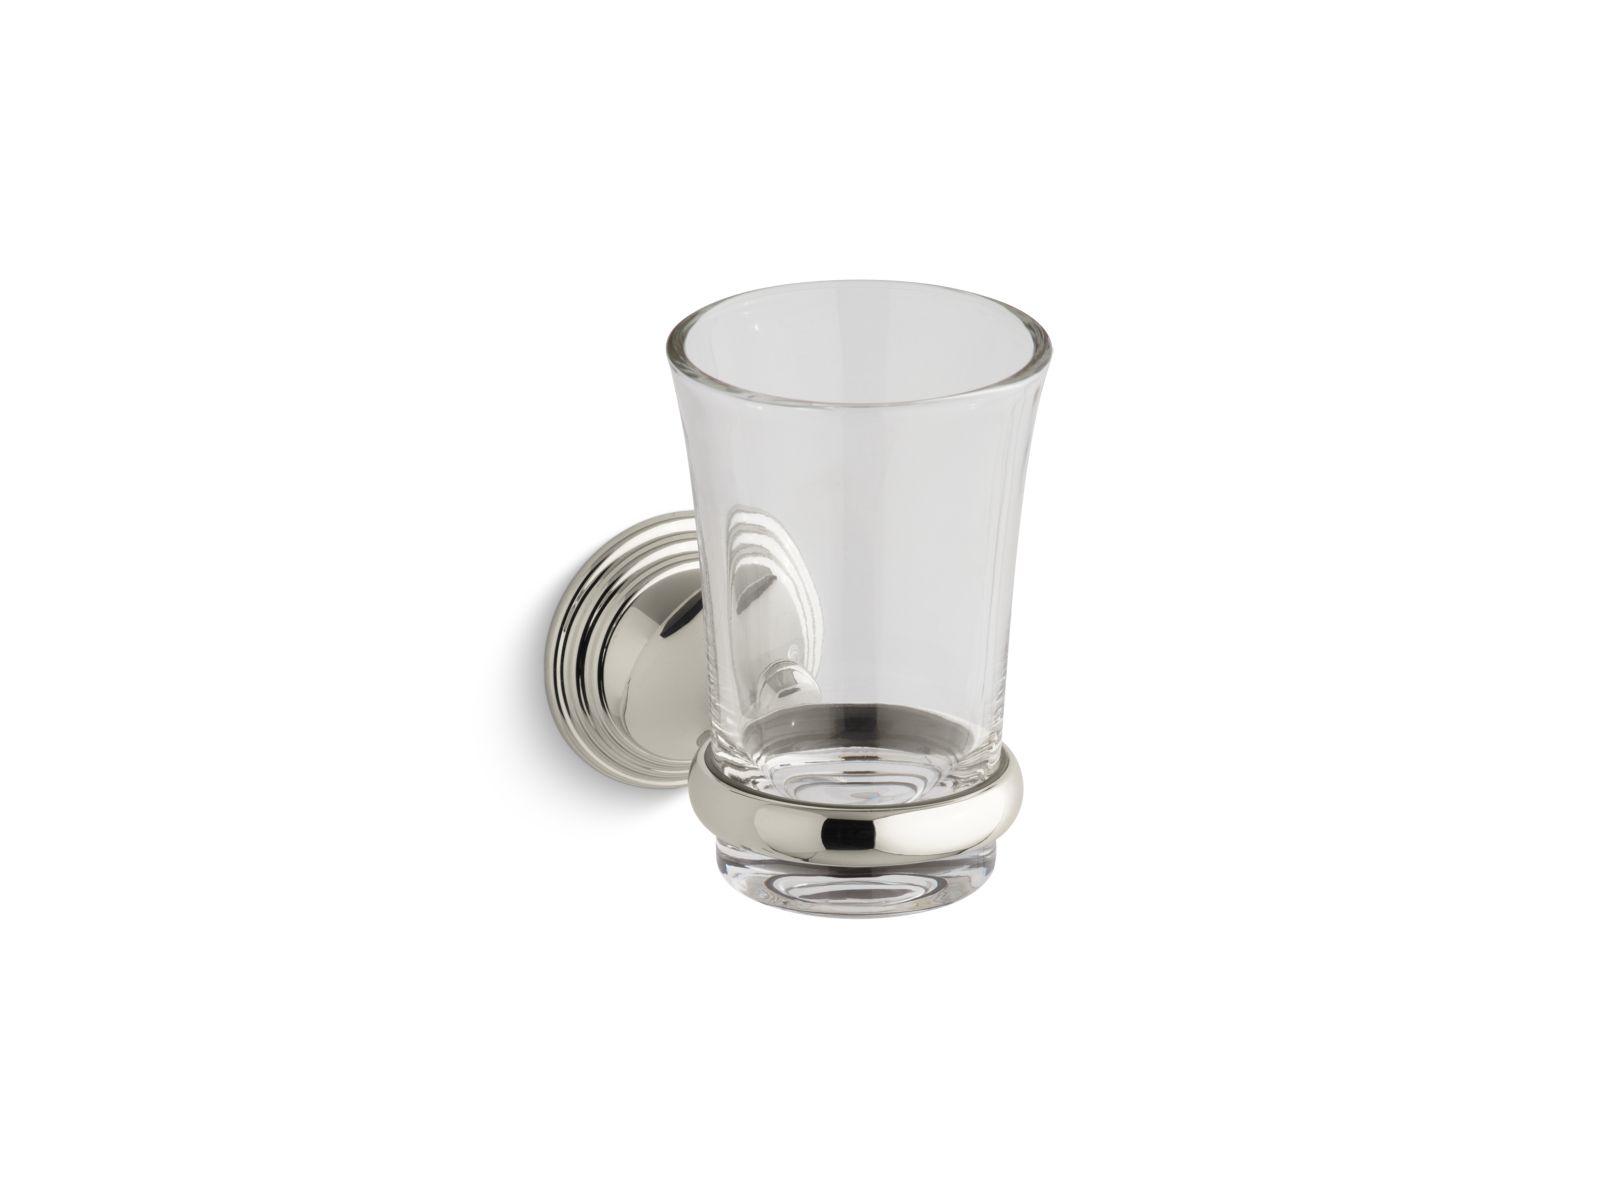 Kohler Devonshire® K-10561-SN Tumbler and holder Vibrant Polished Nickel